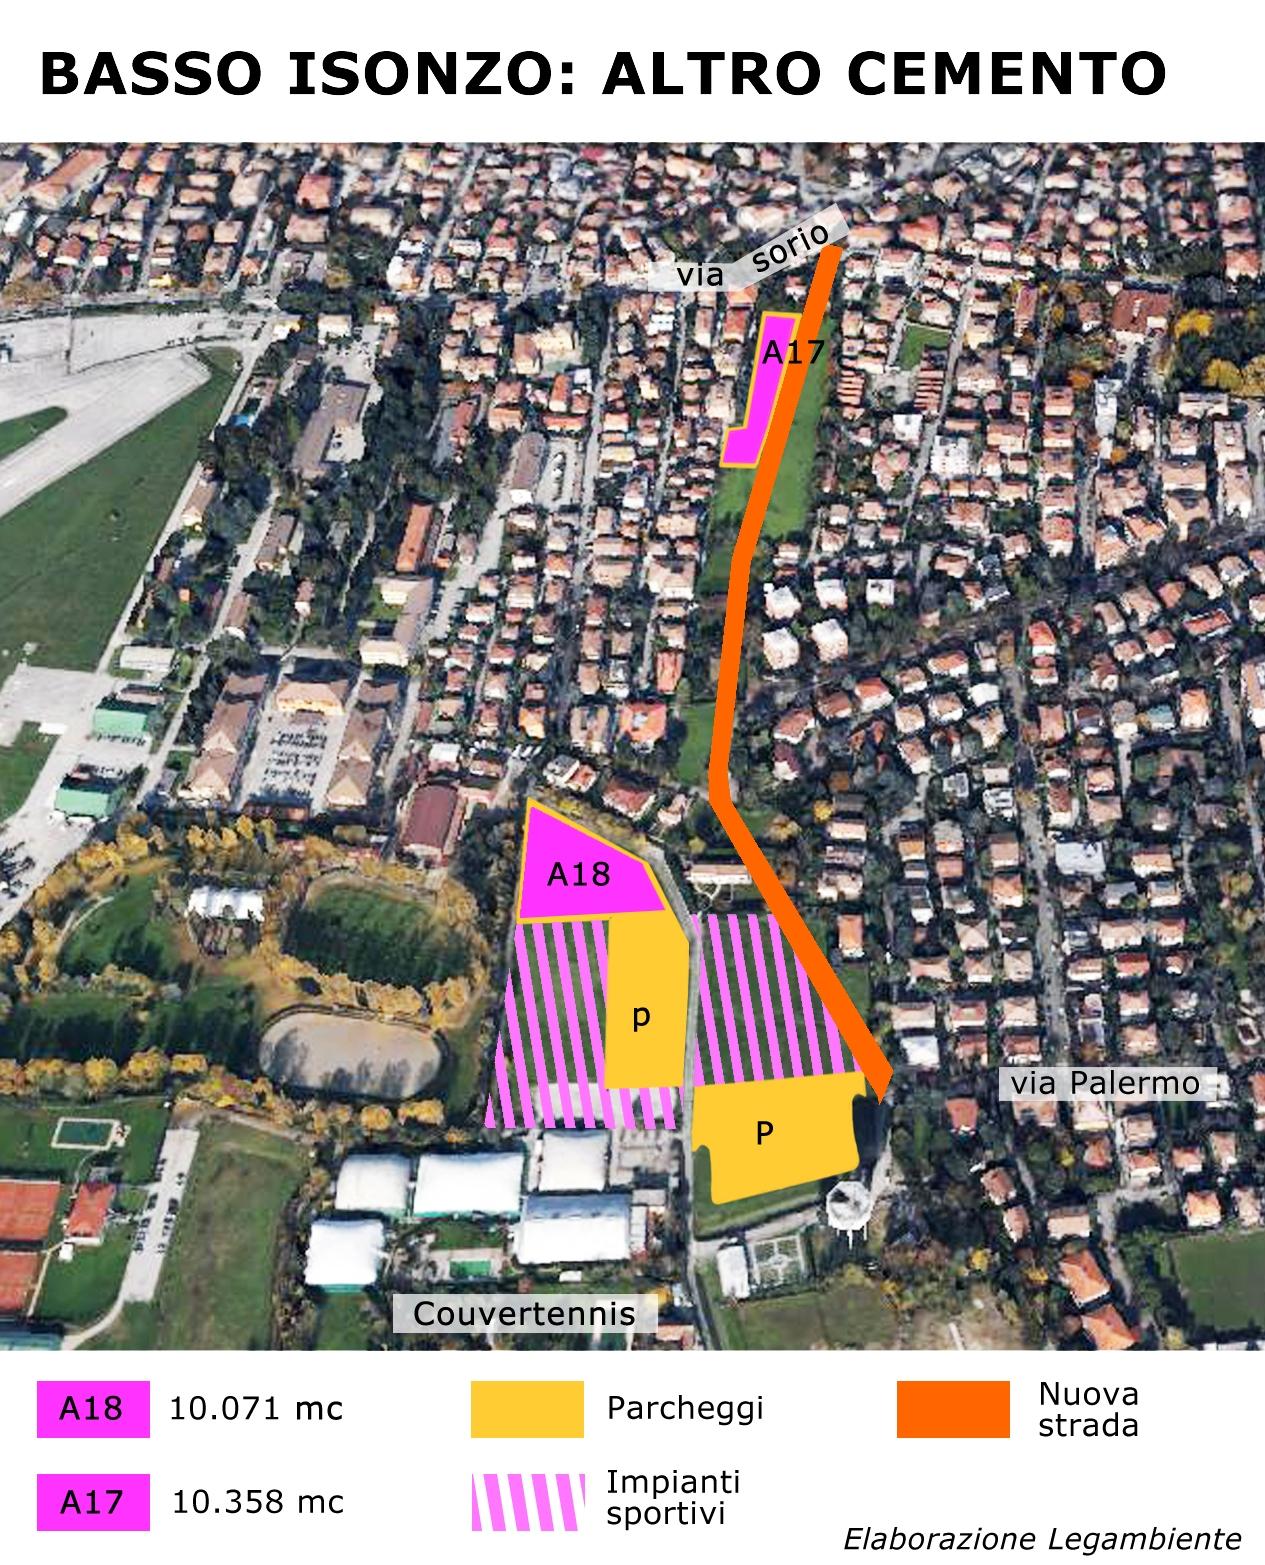 mappa passo isonzo